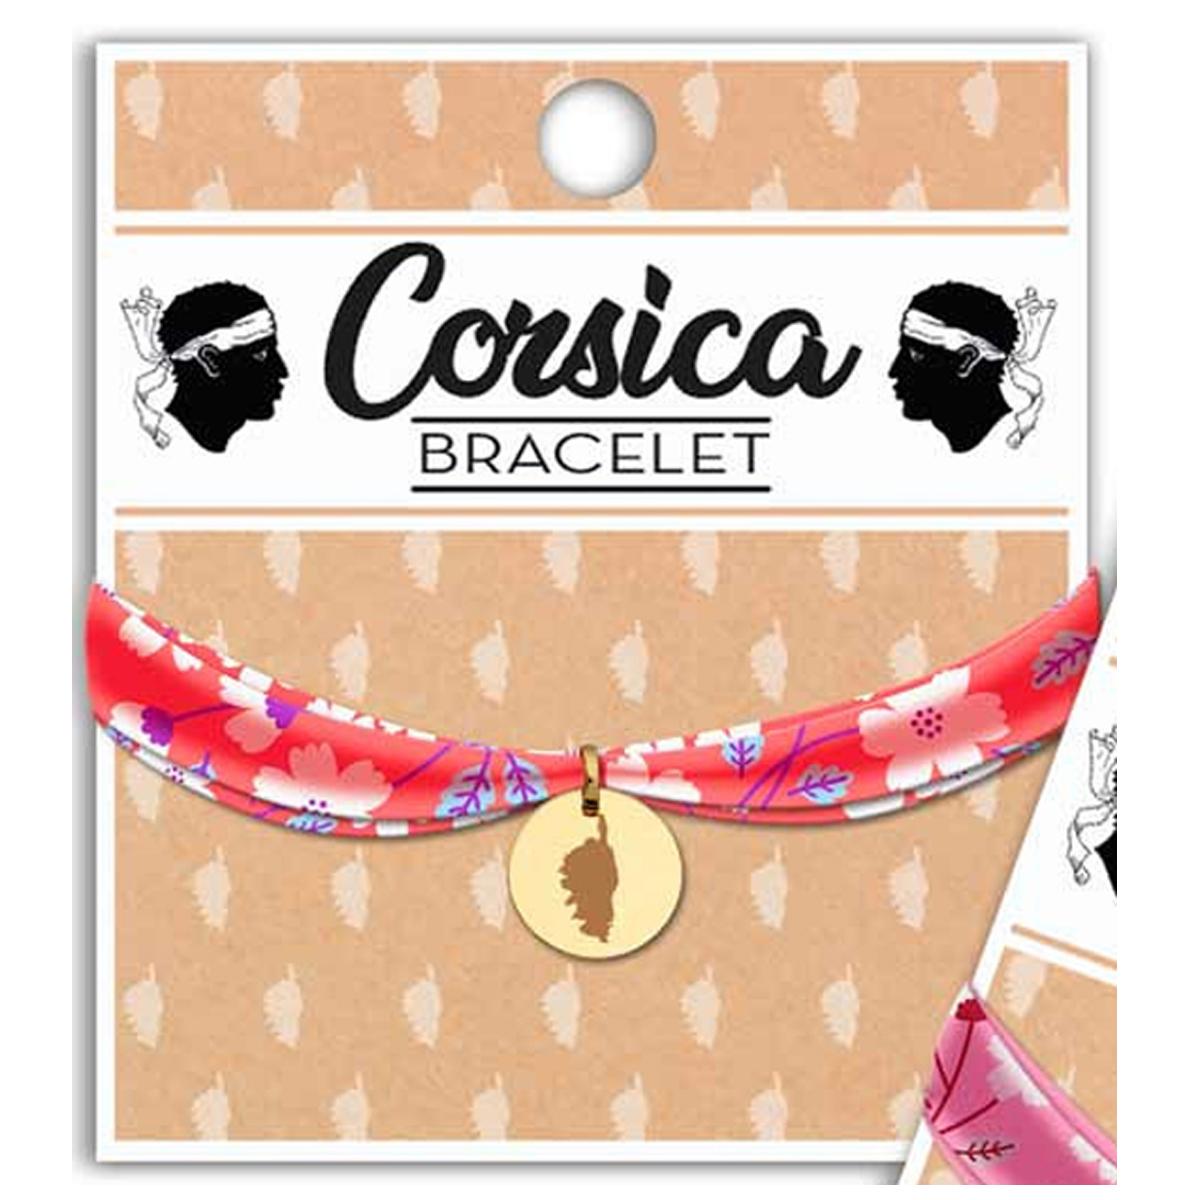 Bracelet \'Corsica\' orange liberty doré (carte corse) - 16 mm - [R2312]